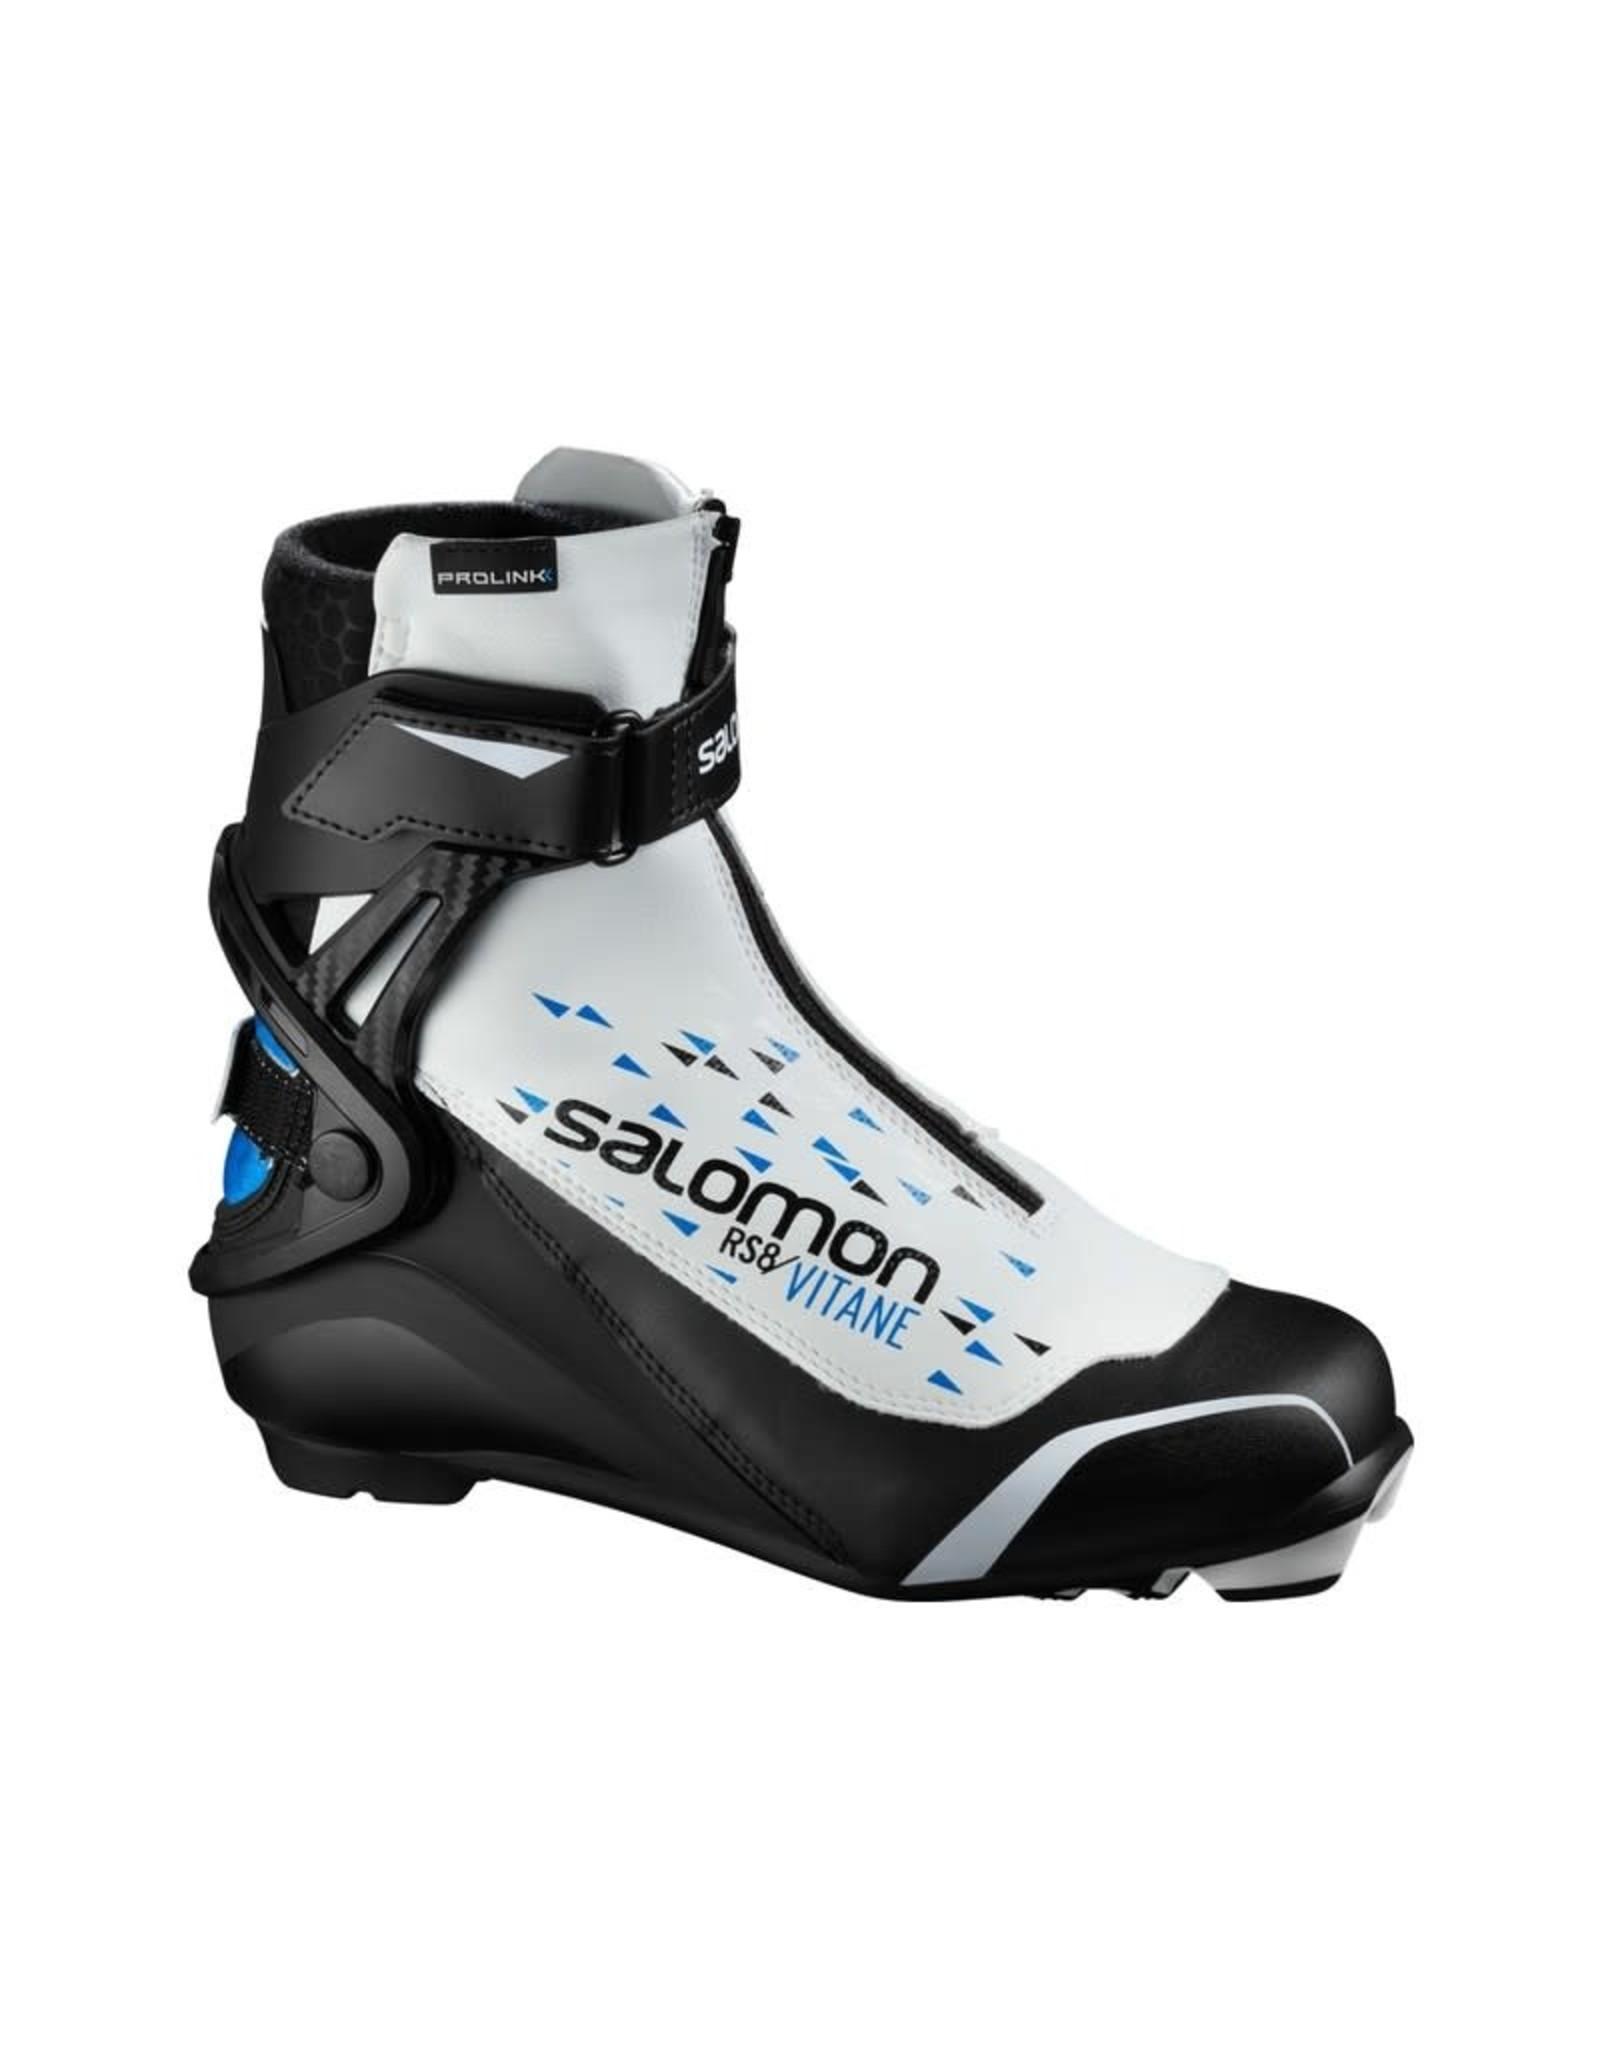 SALOMON '21, Salomon, Boot, RS8 Vitane Prolink